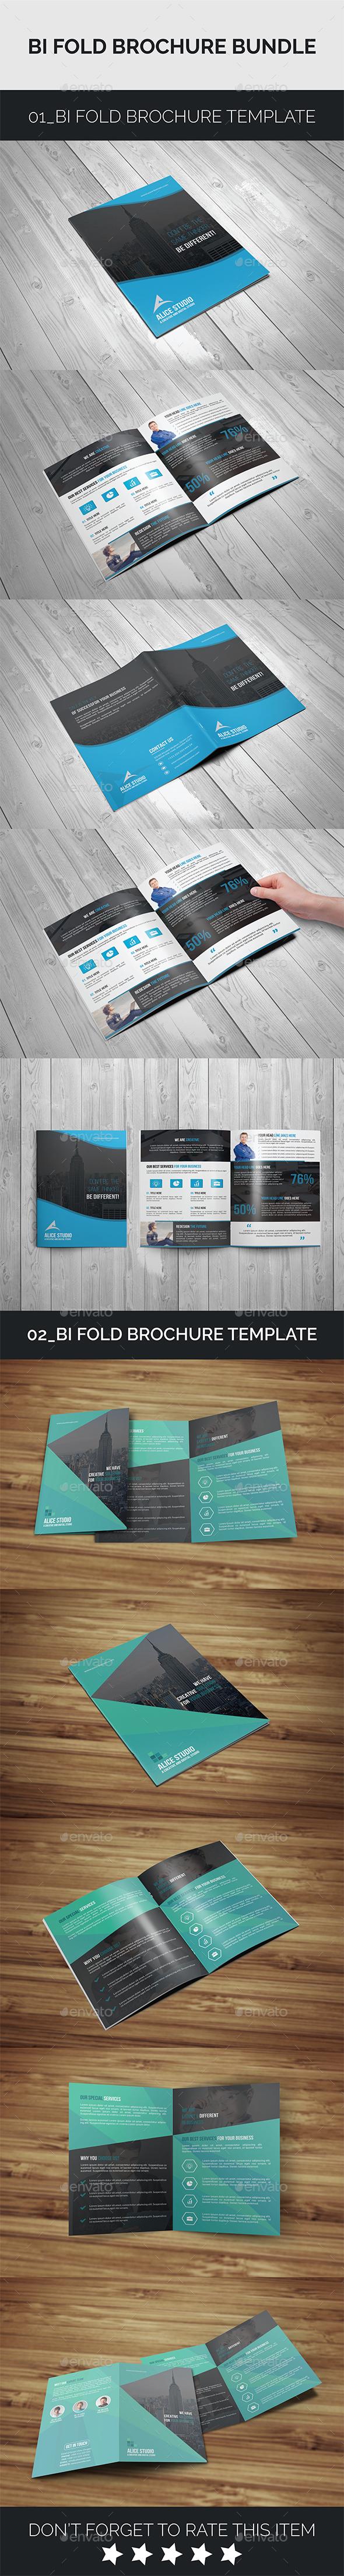 Bi-Fold Brochure Bundle 2in1 - Corporate Brochures